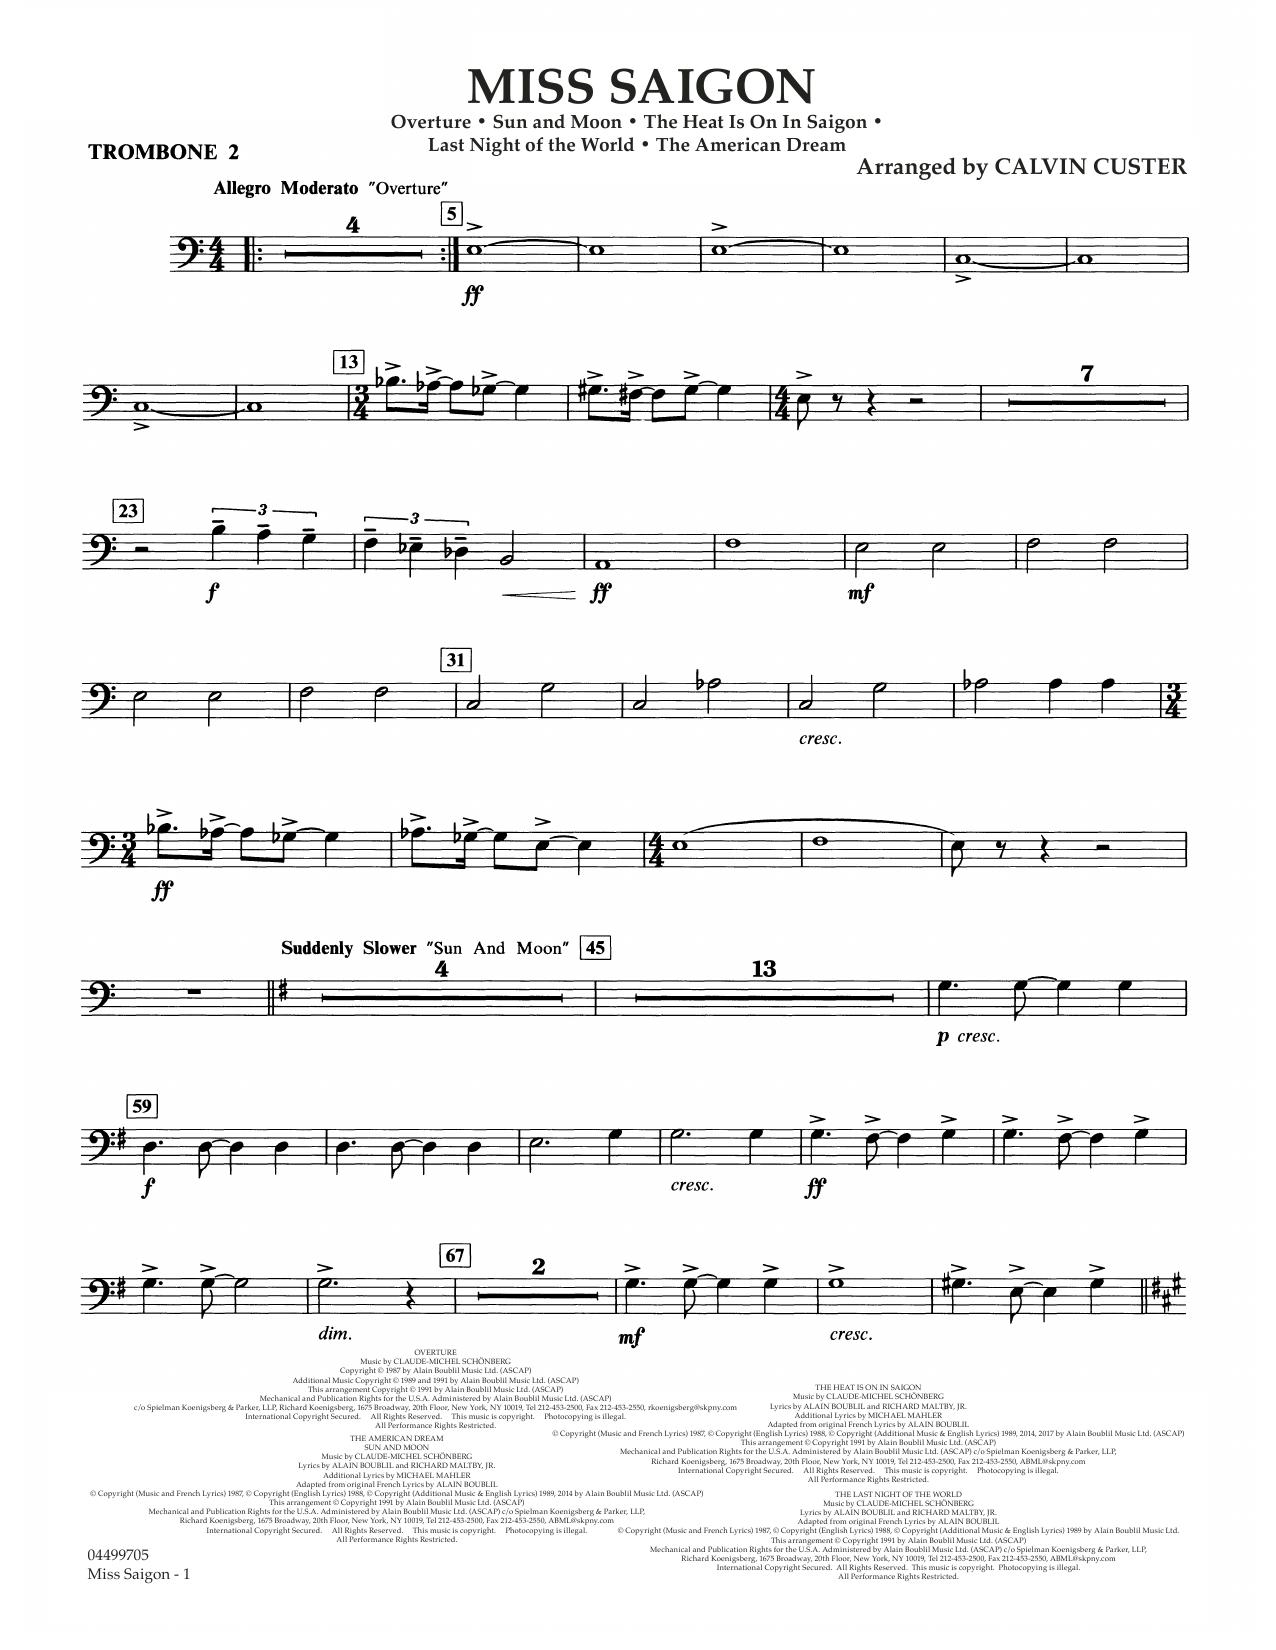 Miss Saigon (arr. Calvin Custer) - Trombone 2 (Full Orchestra)